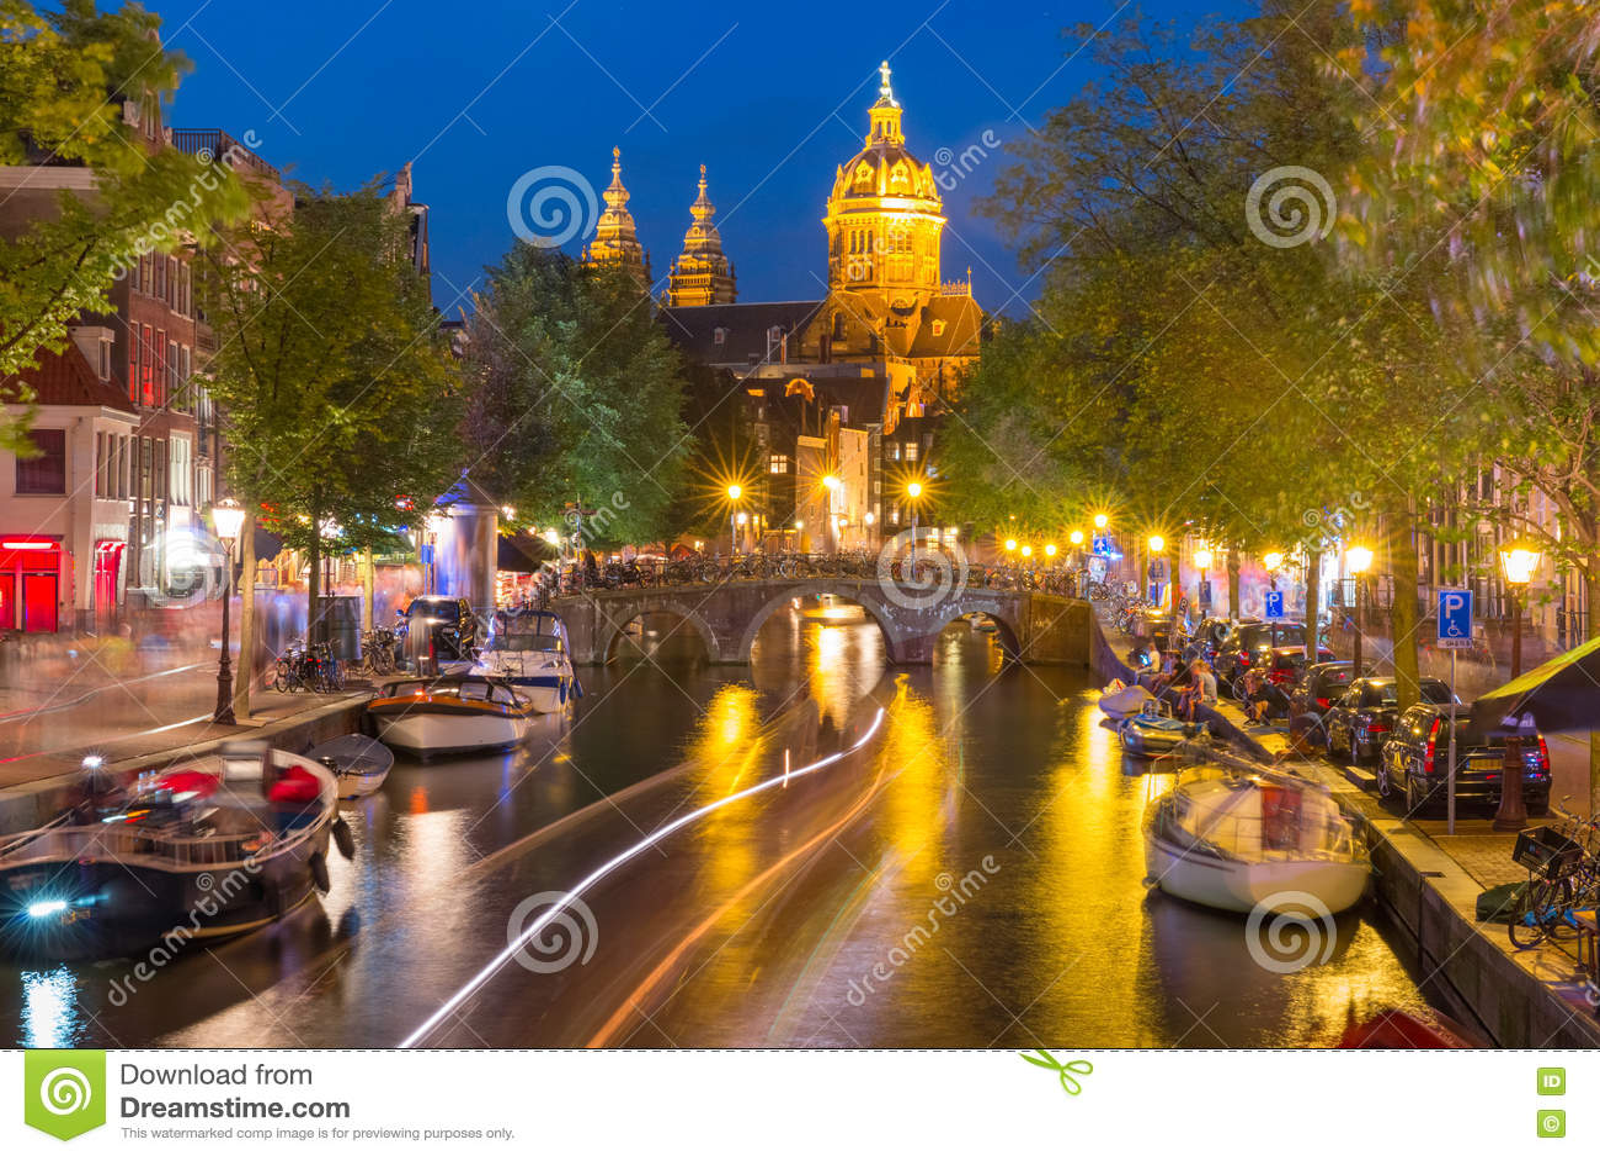 red light district amsterdam night